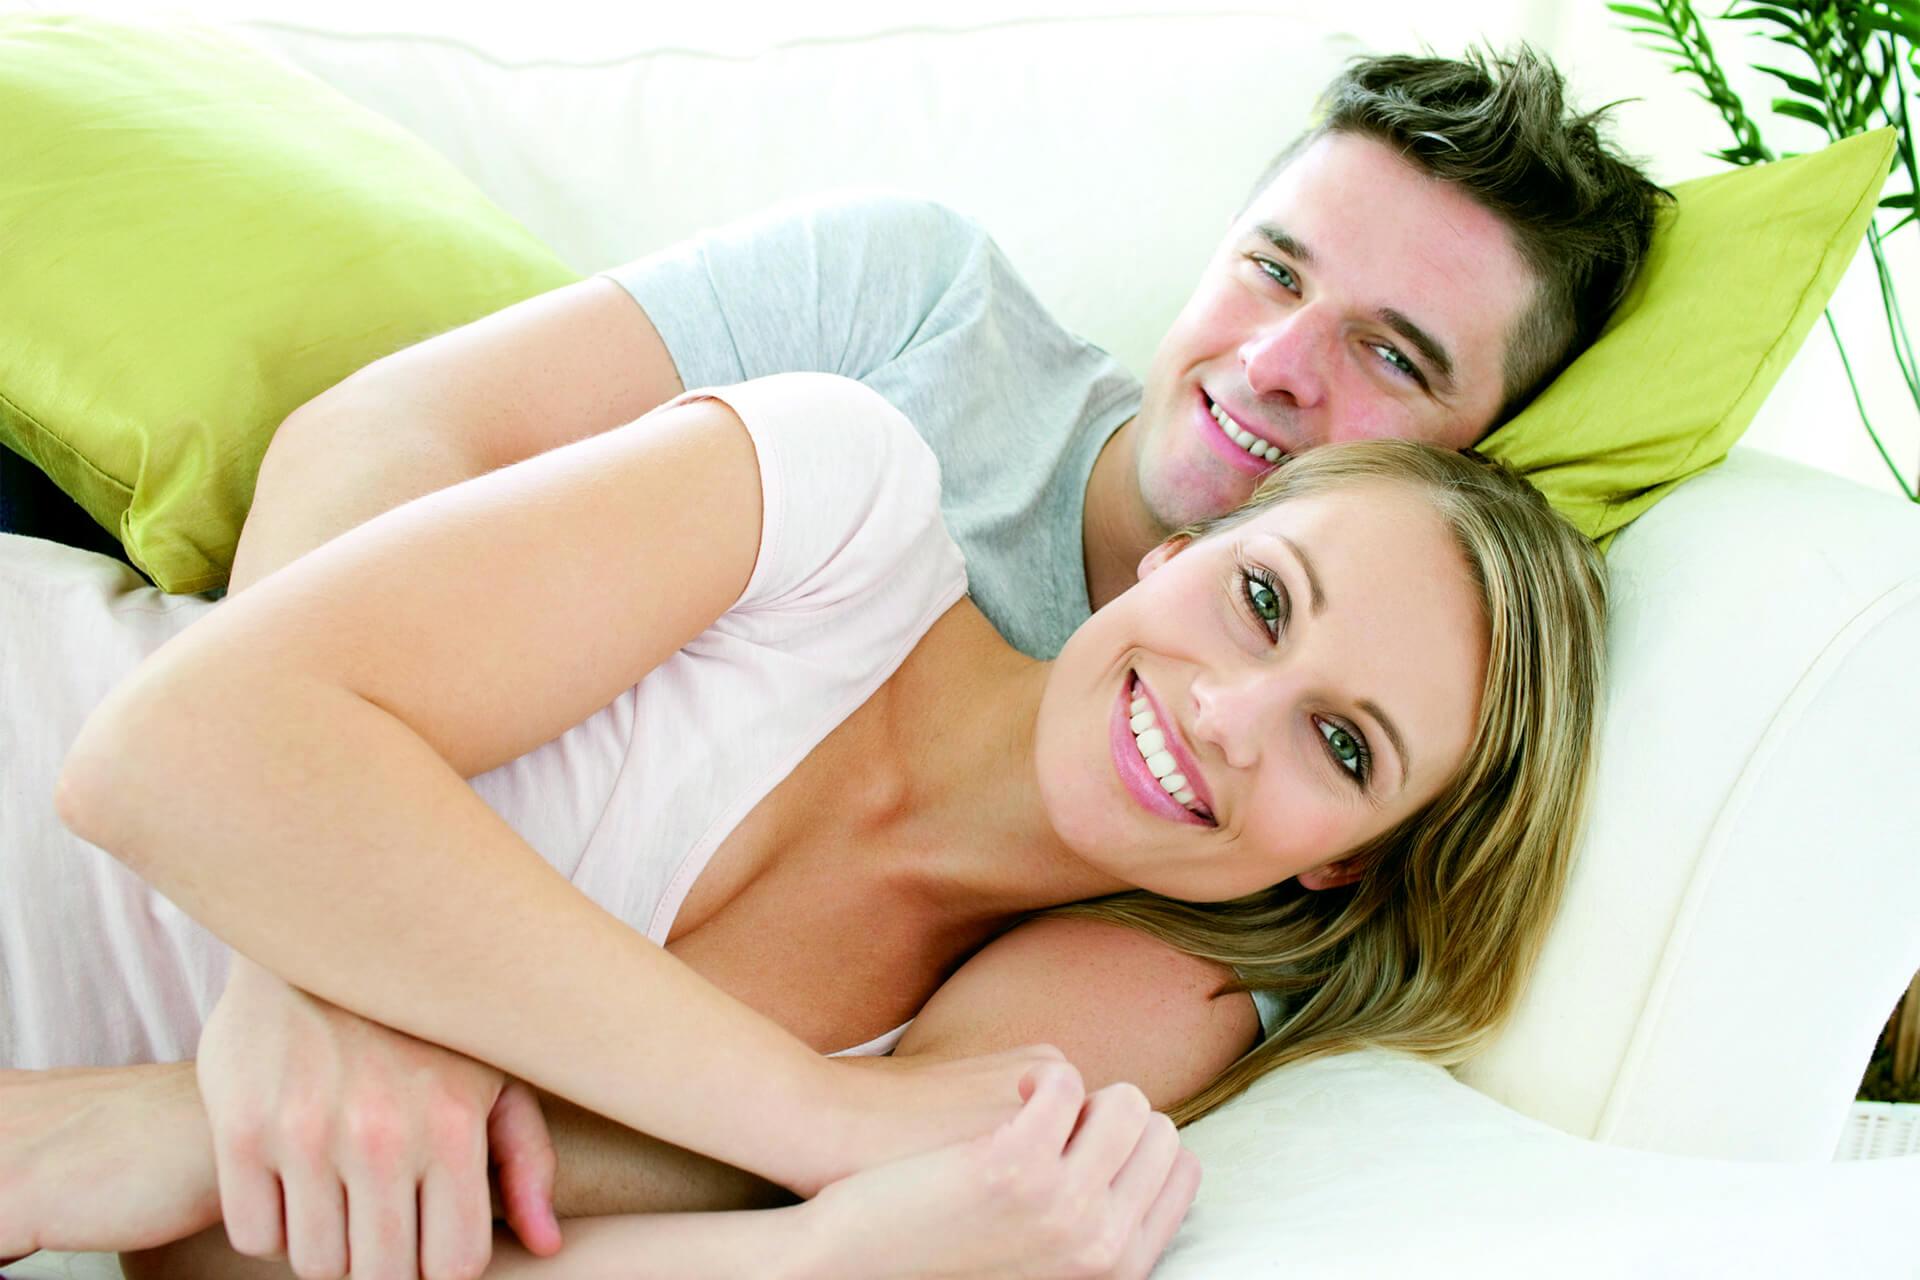 okozhat gonorrhoeát, hogy lefogyjon?)